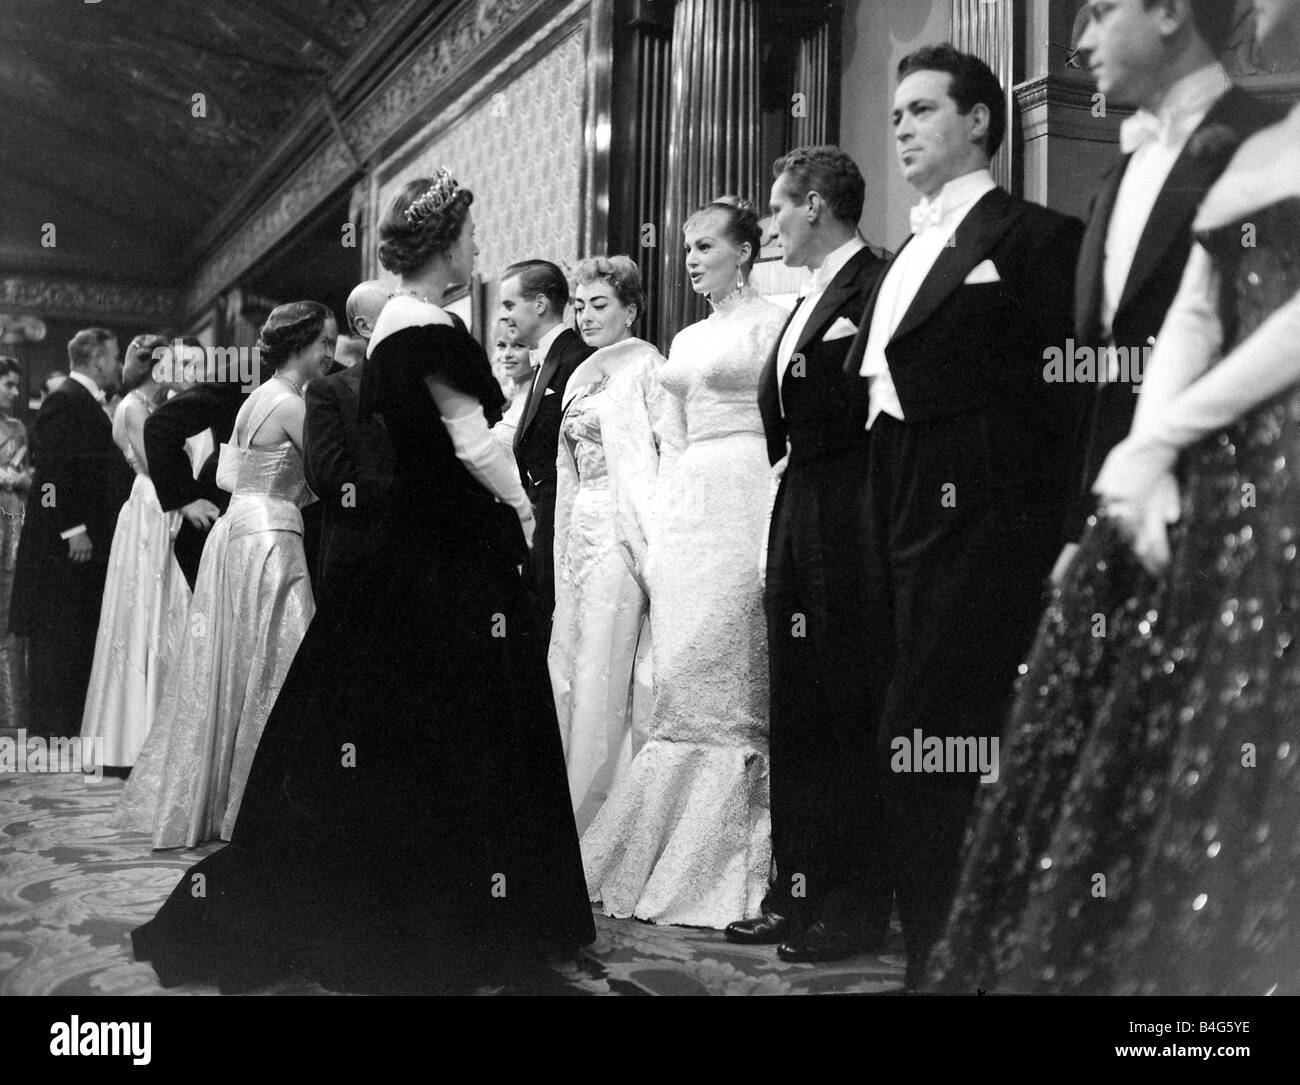 Queen Elizabeth II seen here talking to Actress Anita Ekberg following the 1956 Royal Film Show - Stock Image